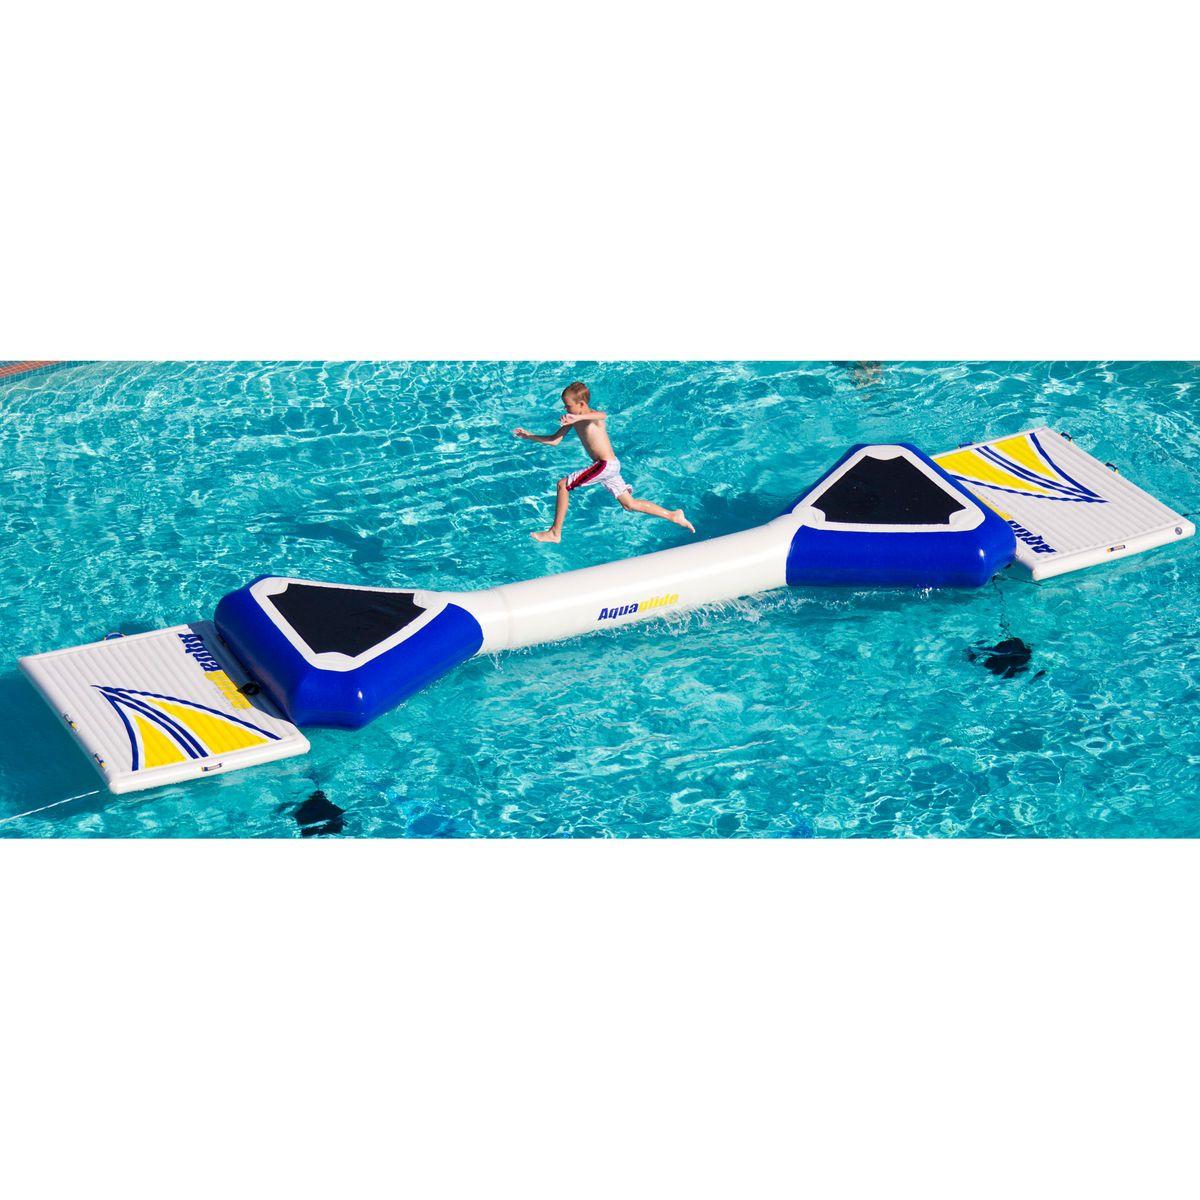 Aquaglide Adventure Series Foxtrot Balance Beam - Overton's